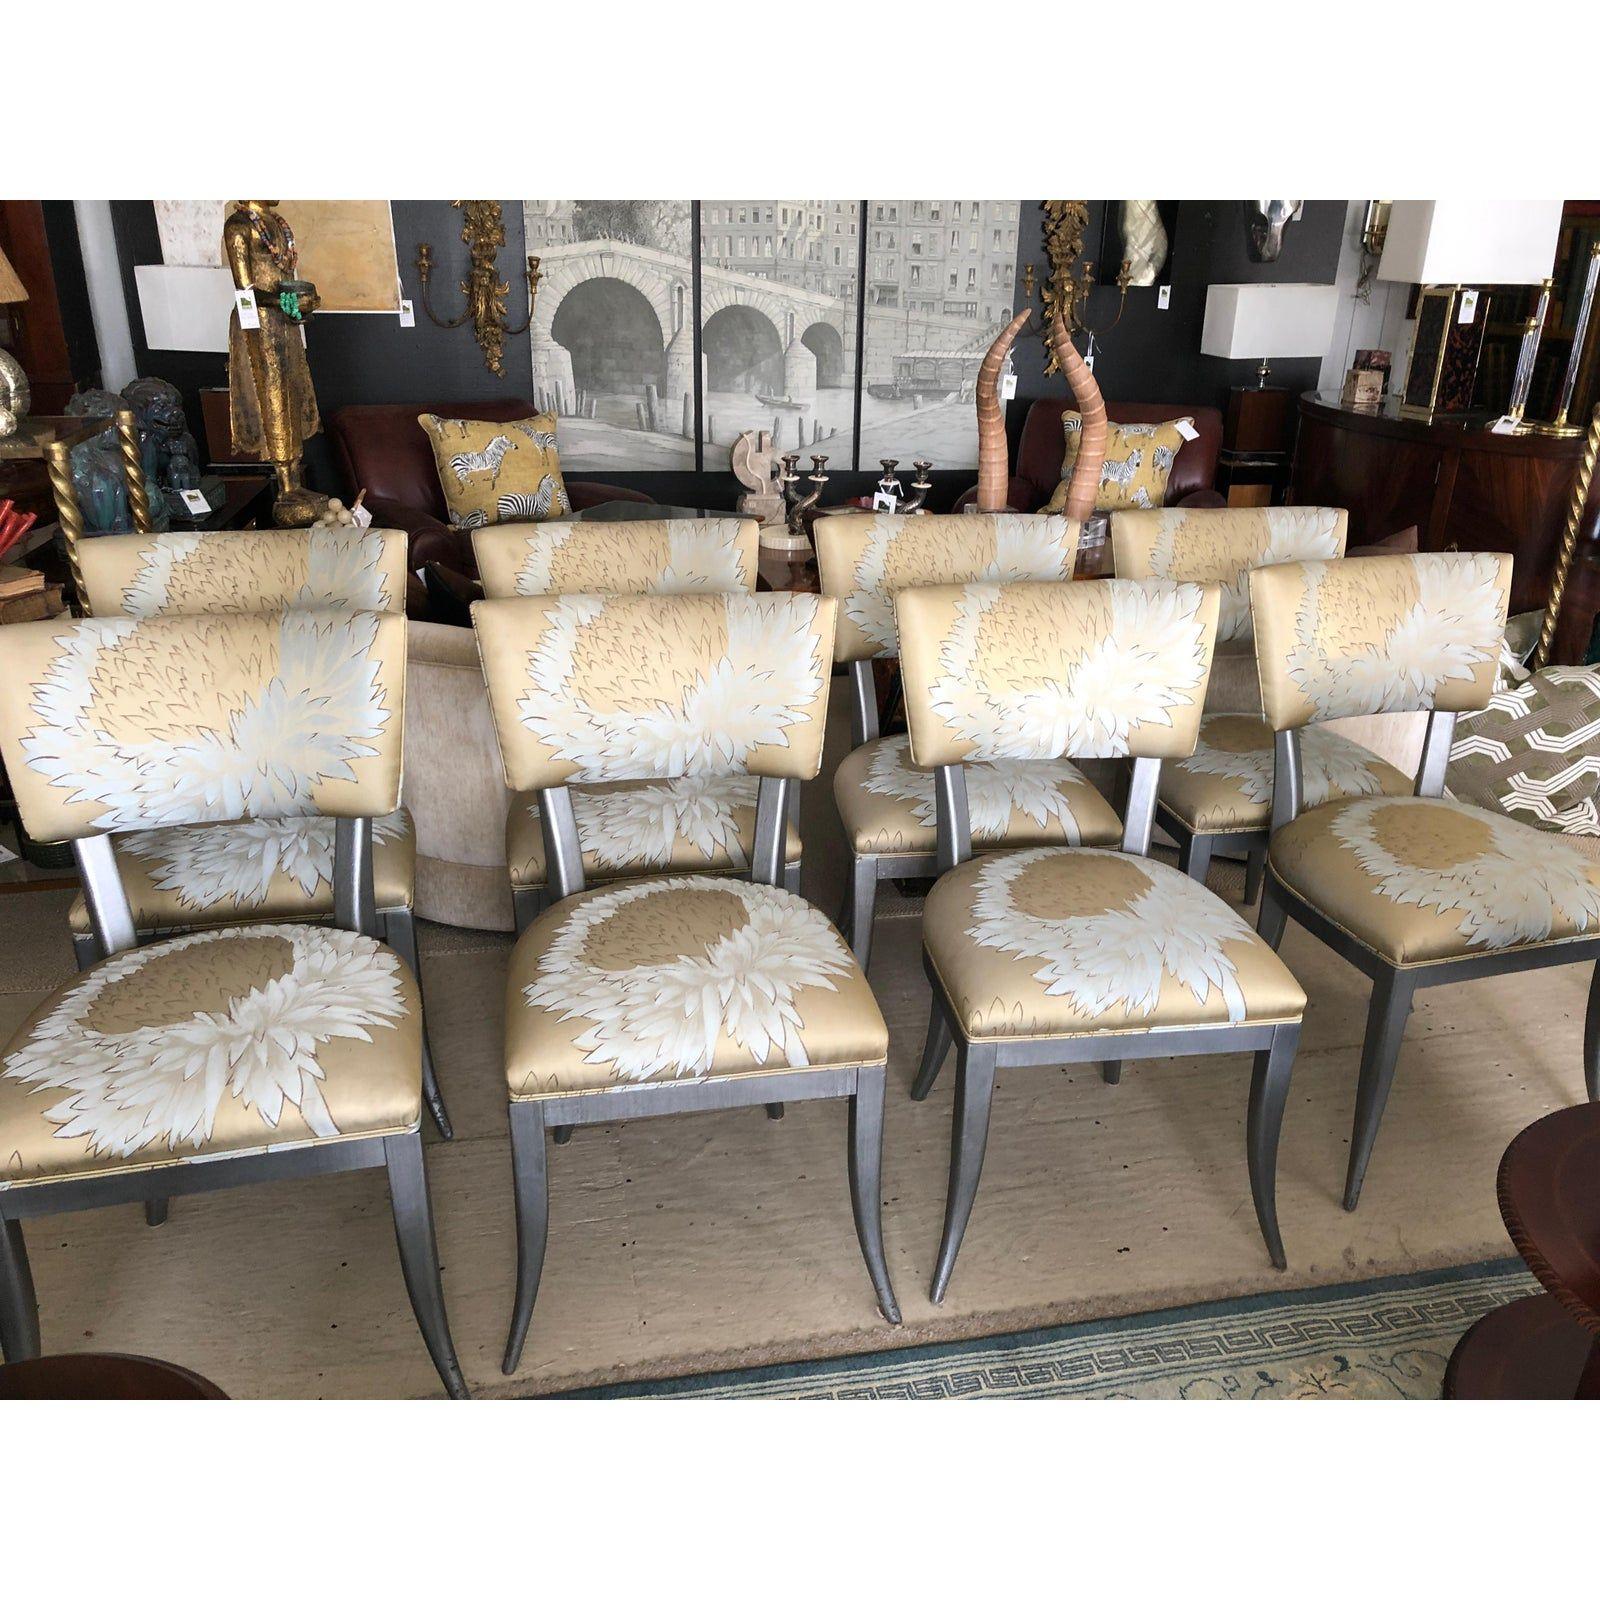 Custom Klismos Dining Chairs Set Of 8 Chairish Dining Chairs Klismos Dining Chair Chair Set of 8 dining chairs